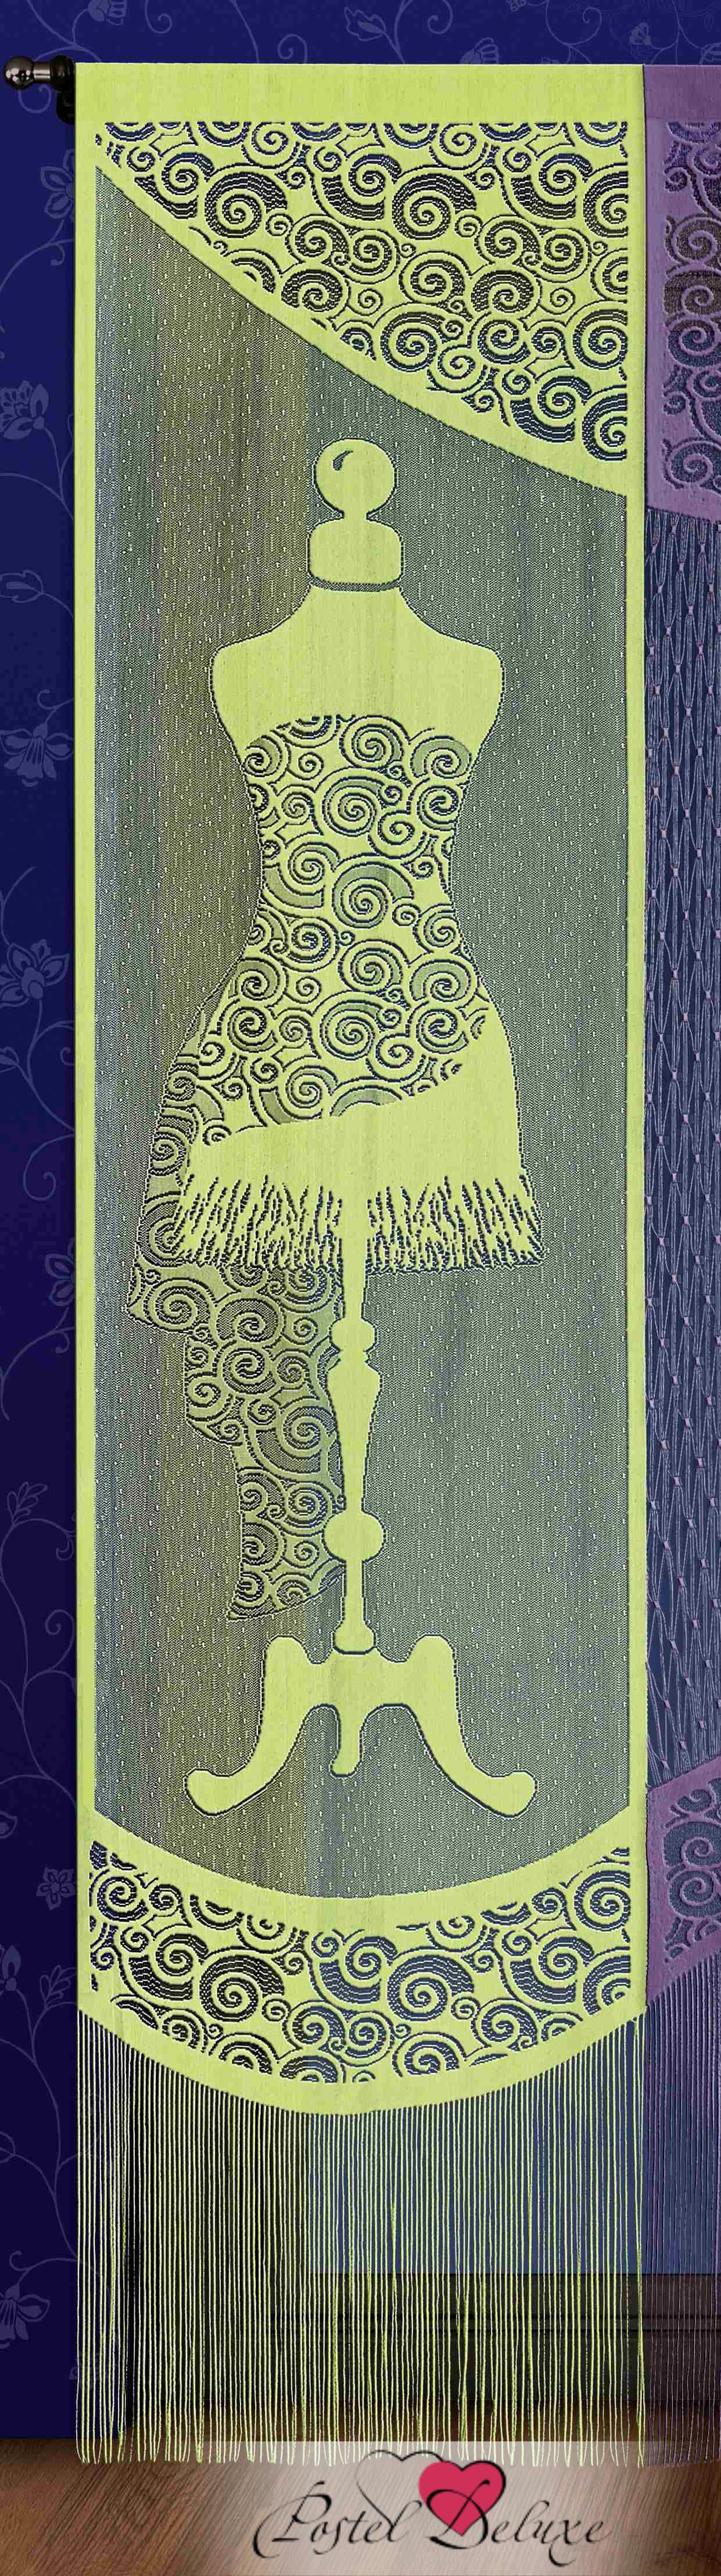 Шторы Wisan Японские шторы Гардероб (Манекен) Цвет: Лайм салон штор карниз гардины тольятти